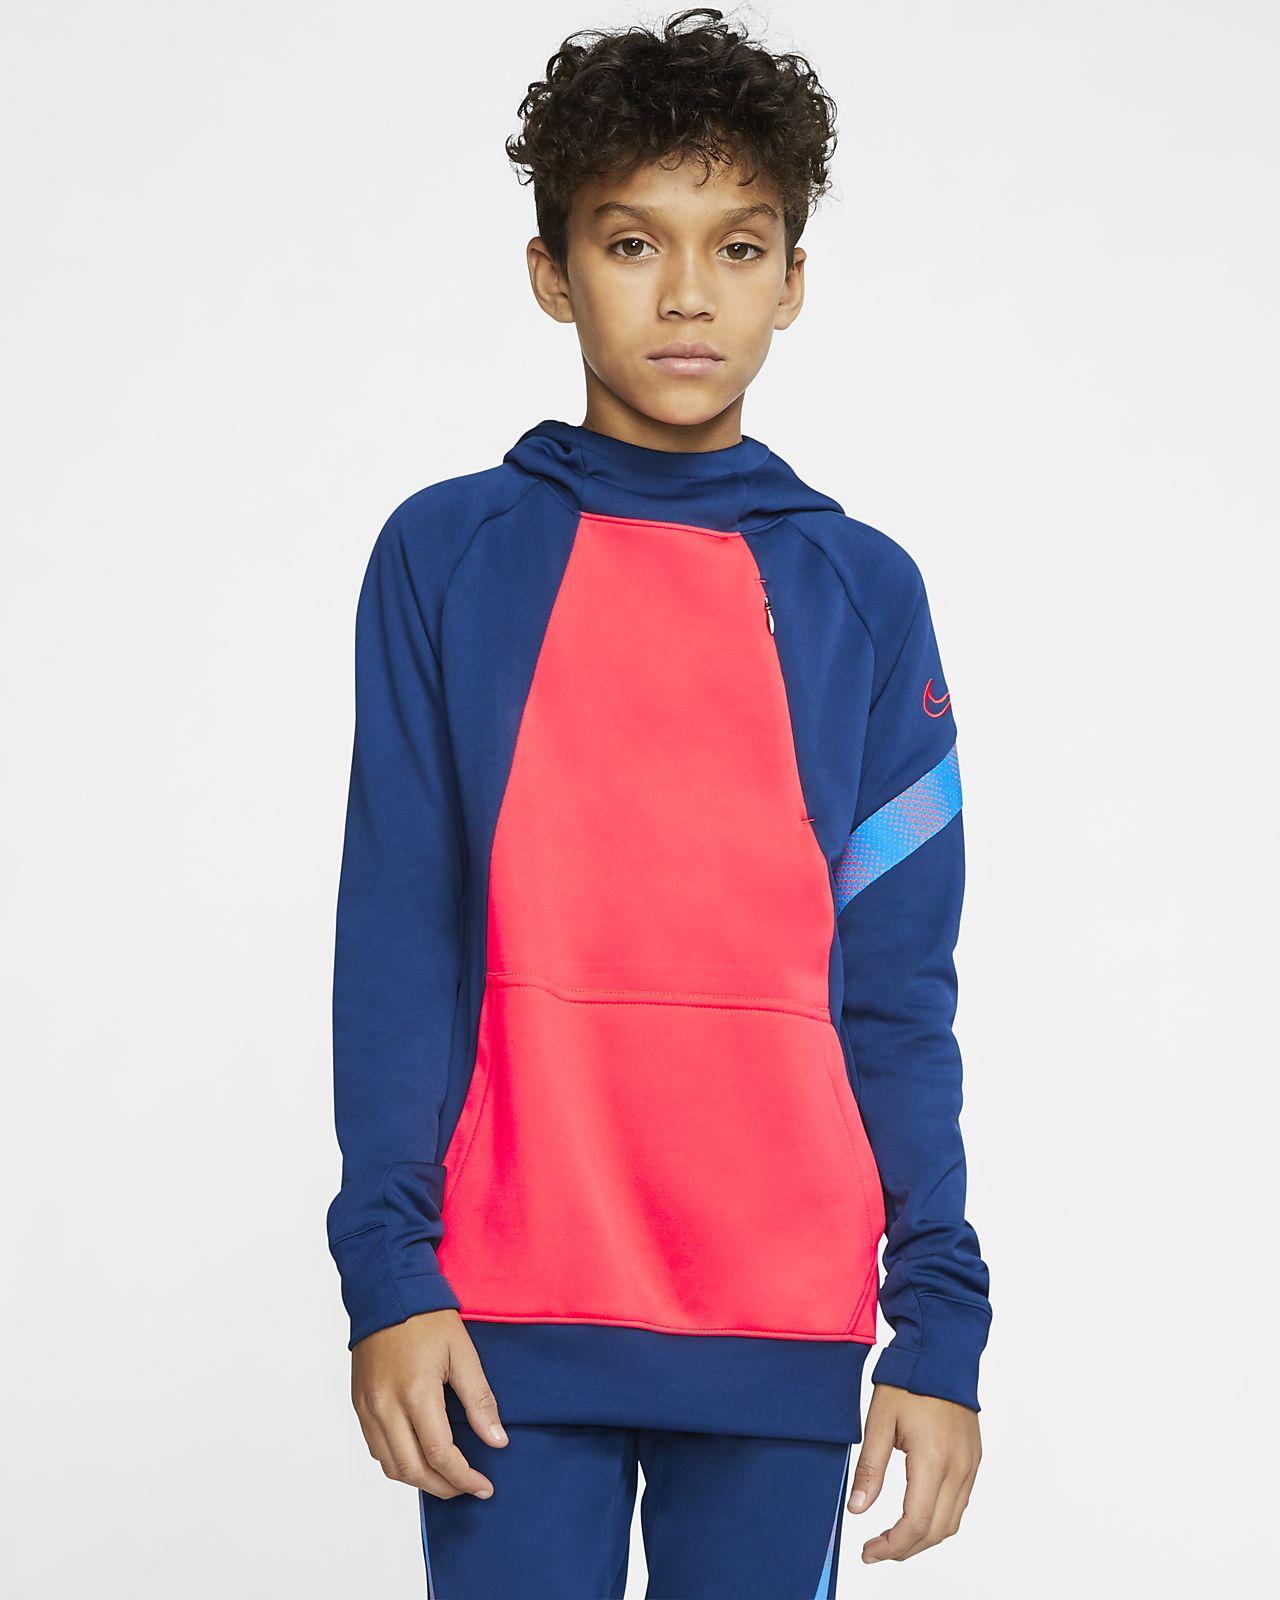 Nike Dri-FIT Academy Pro Genç Çocuk Kapüşonlu Futbol Sweatshirt'ü